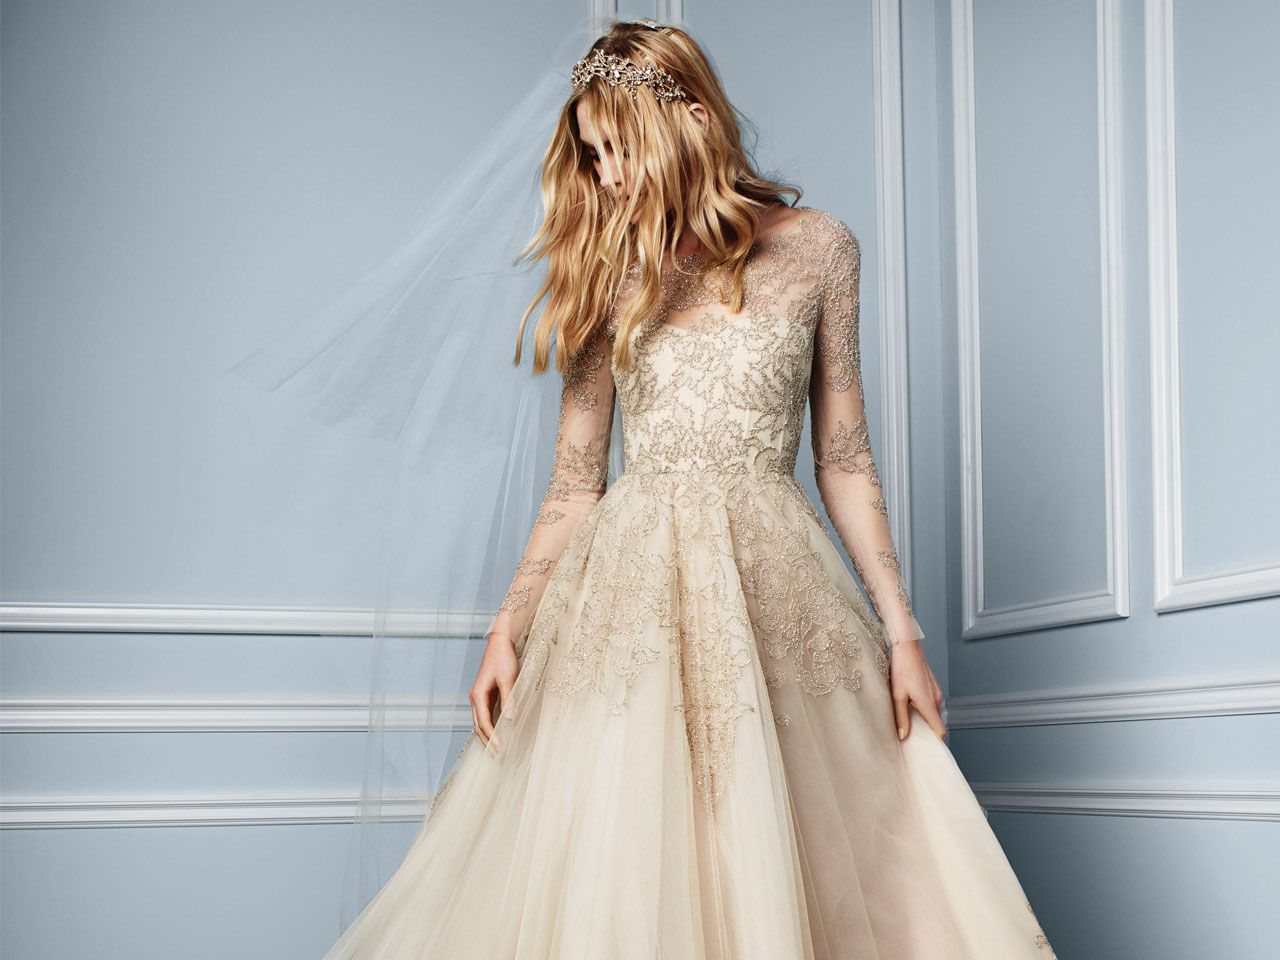 All The Deets On Georgina Wilsons Monique Lhuillier Wedding Gown